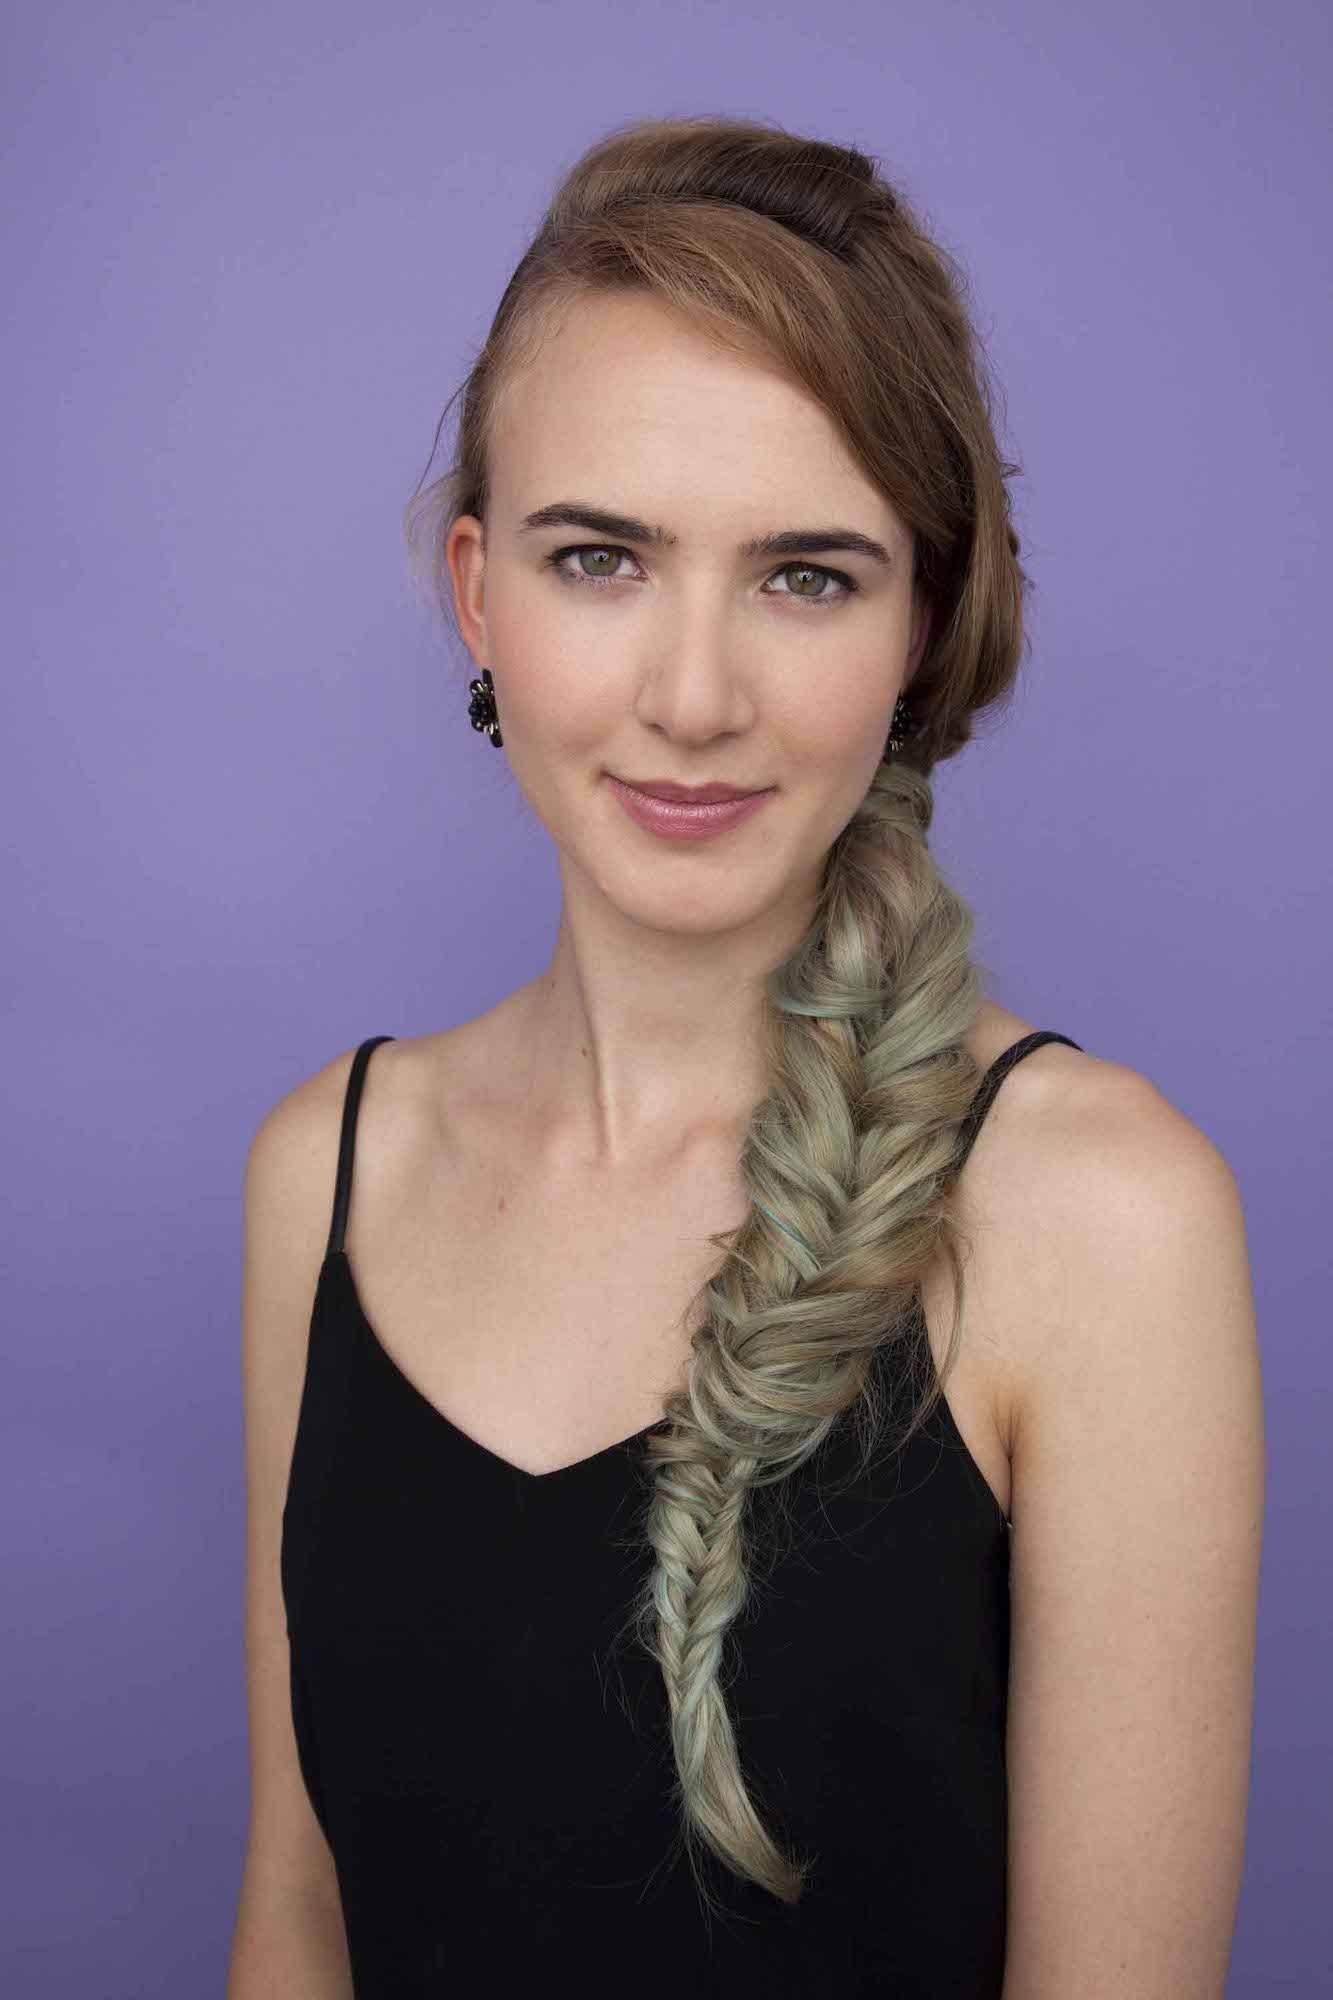 Fishtail braid pada perempuan kaukasia